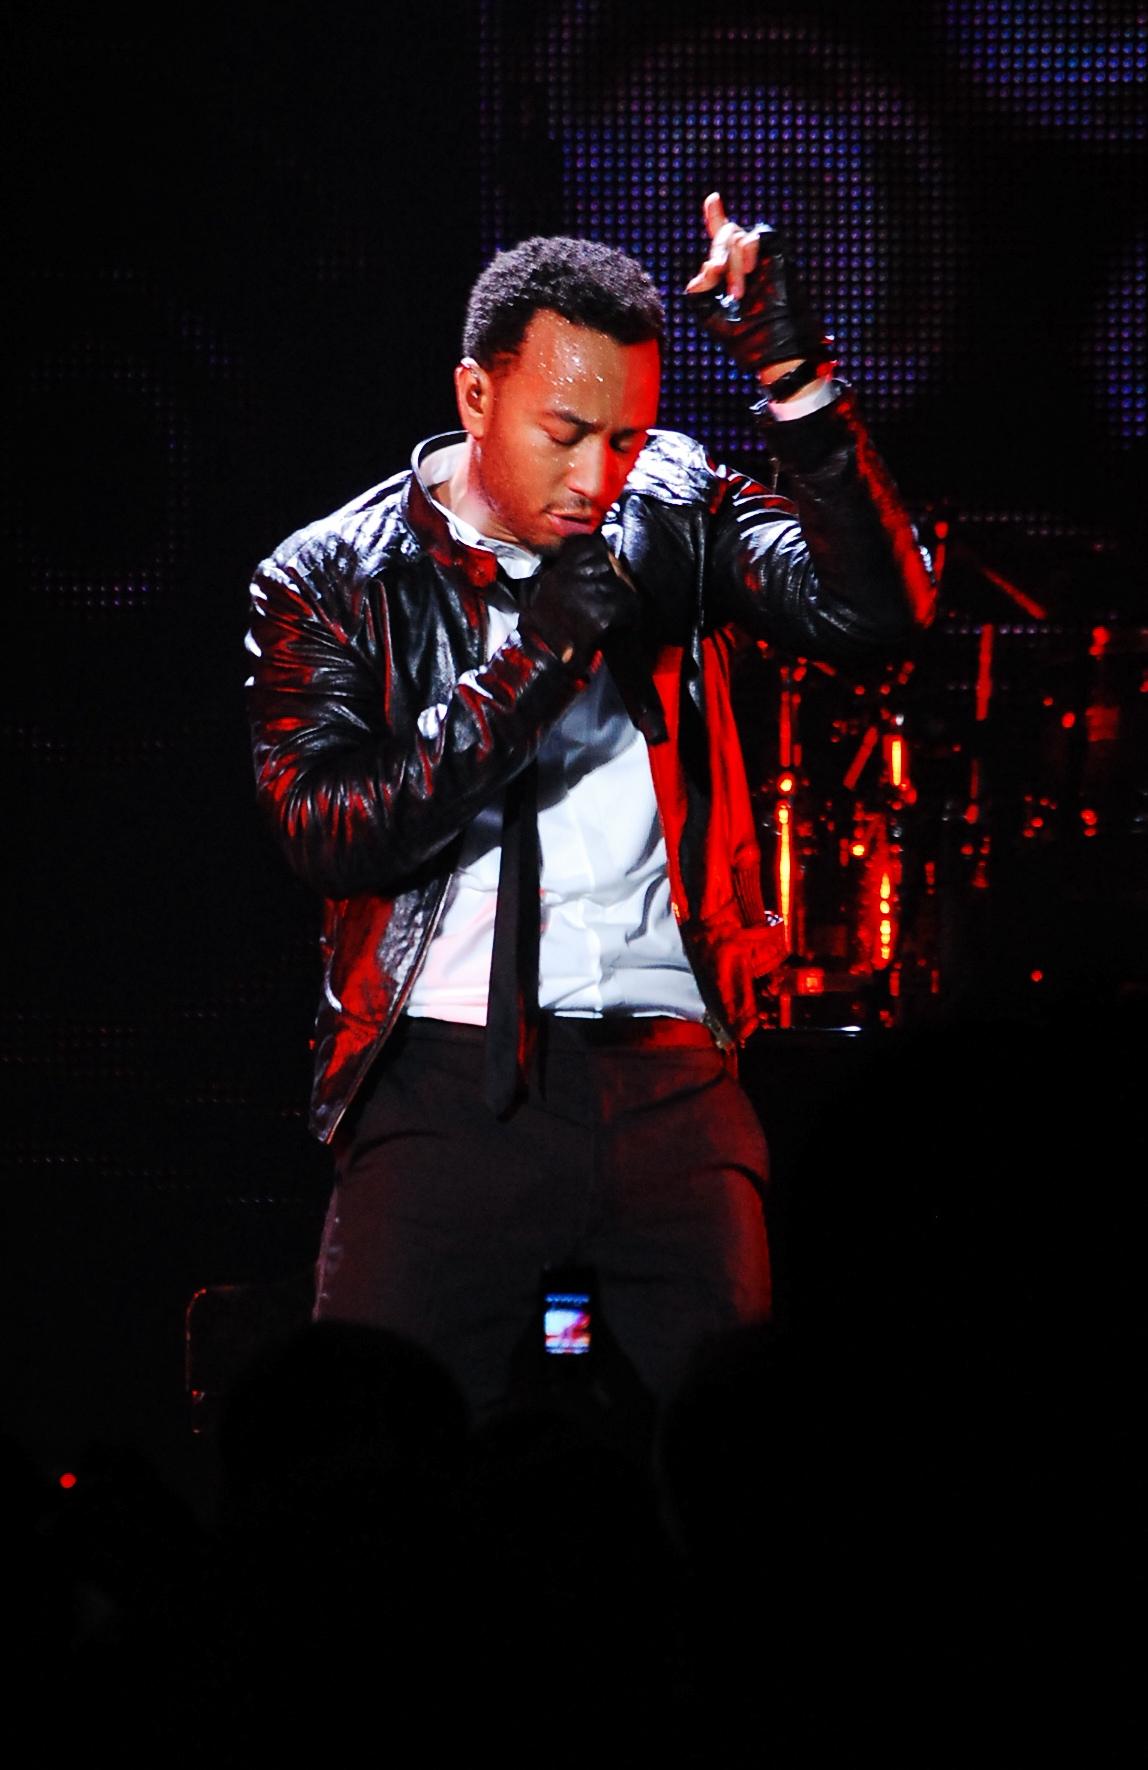 John Legend discography - Wikipedia